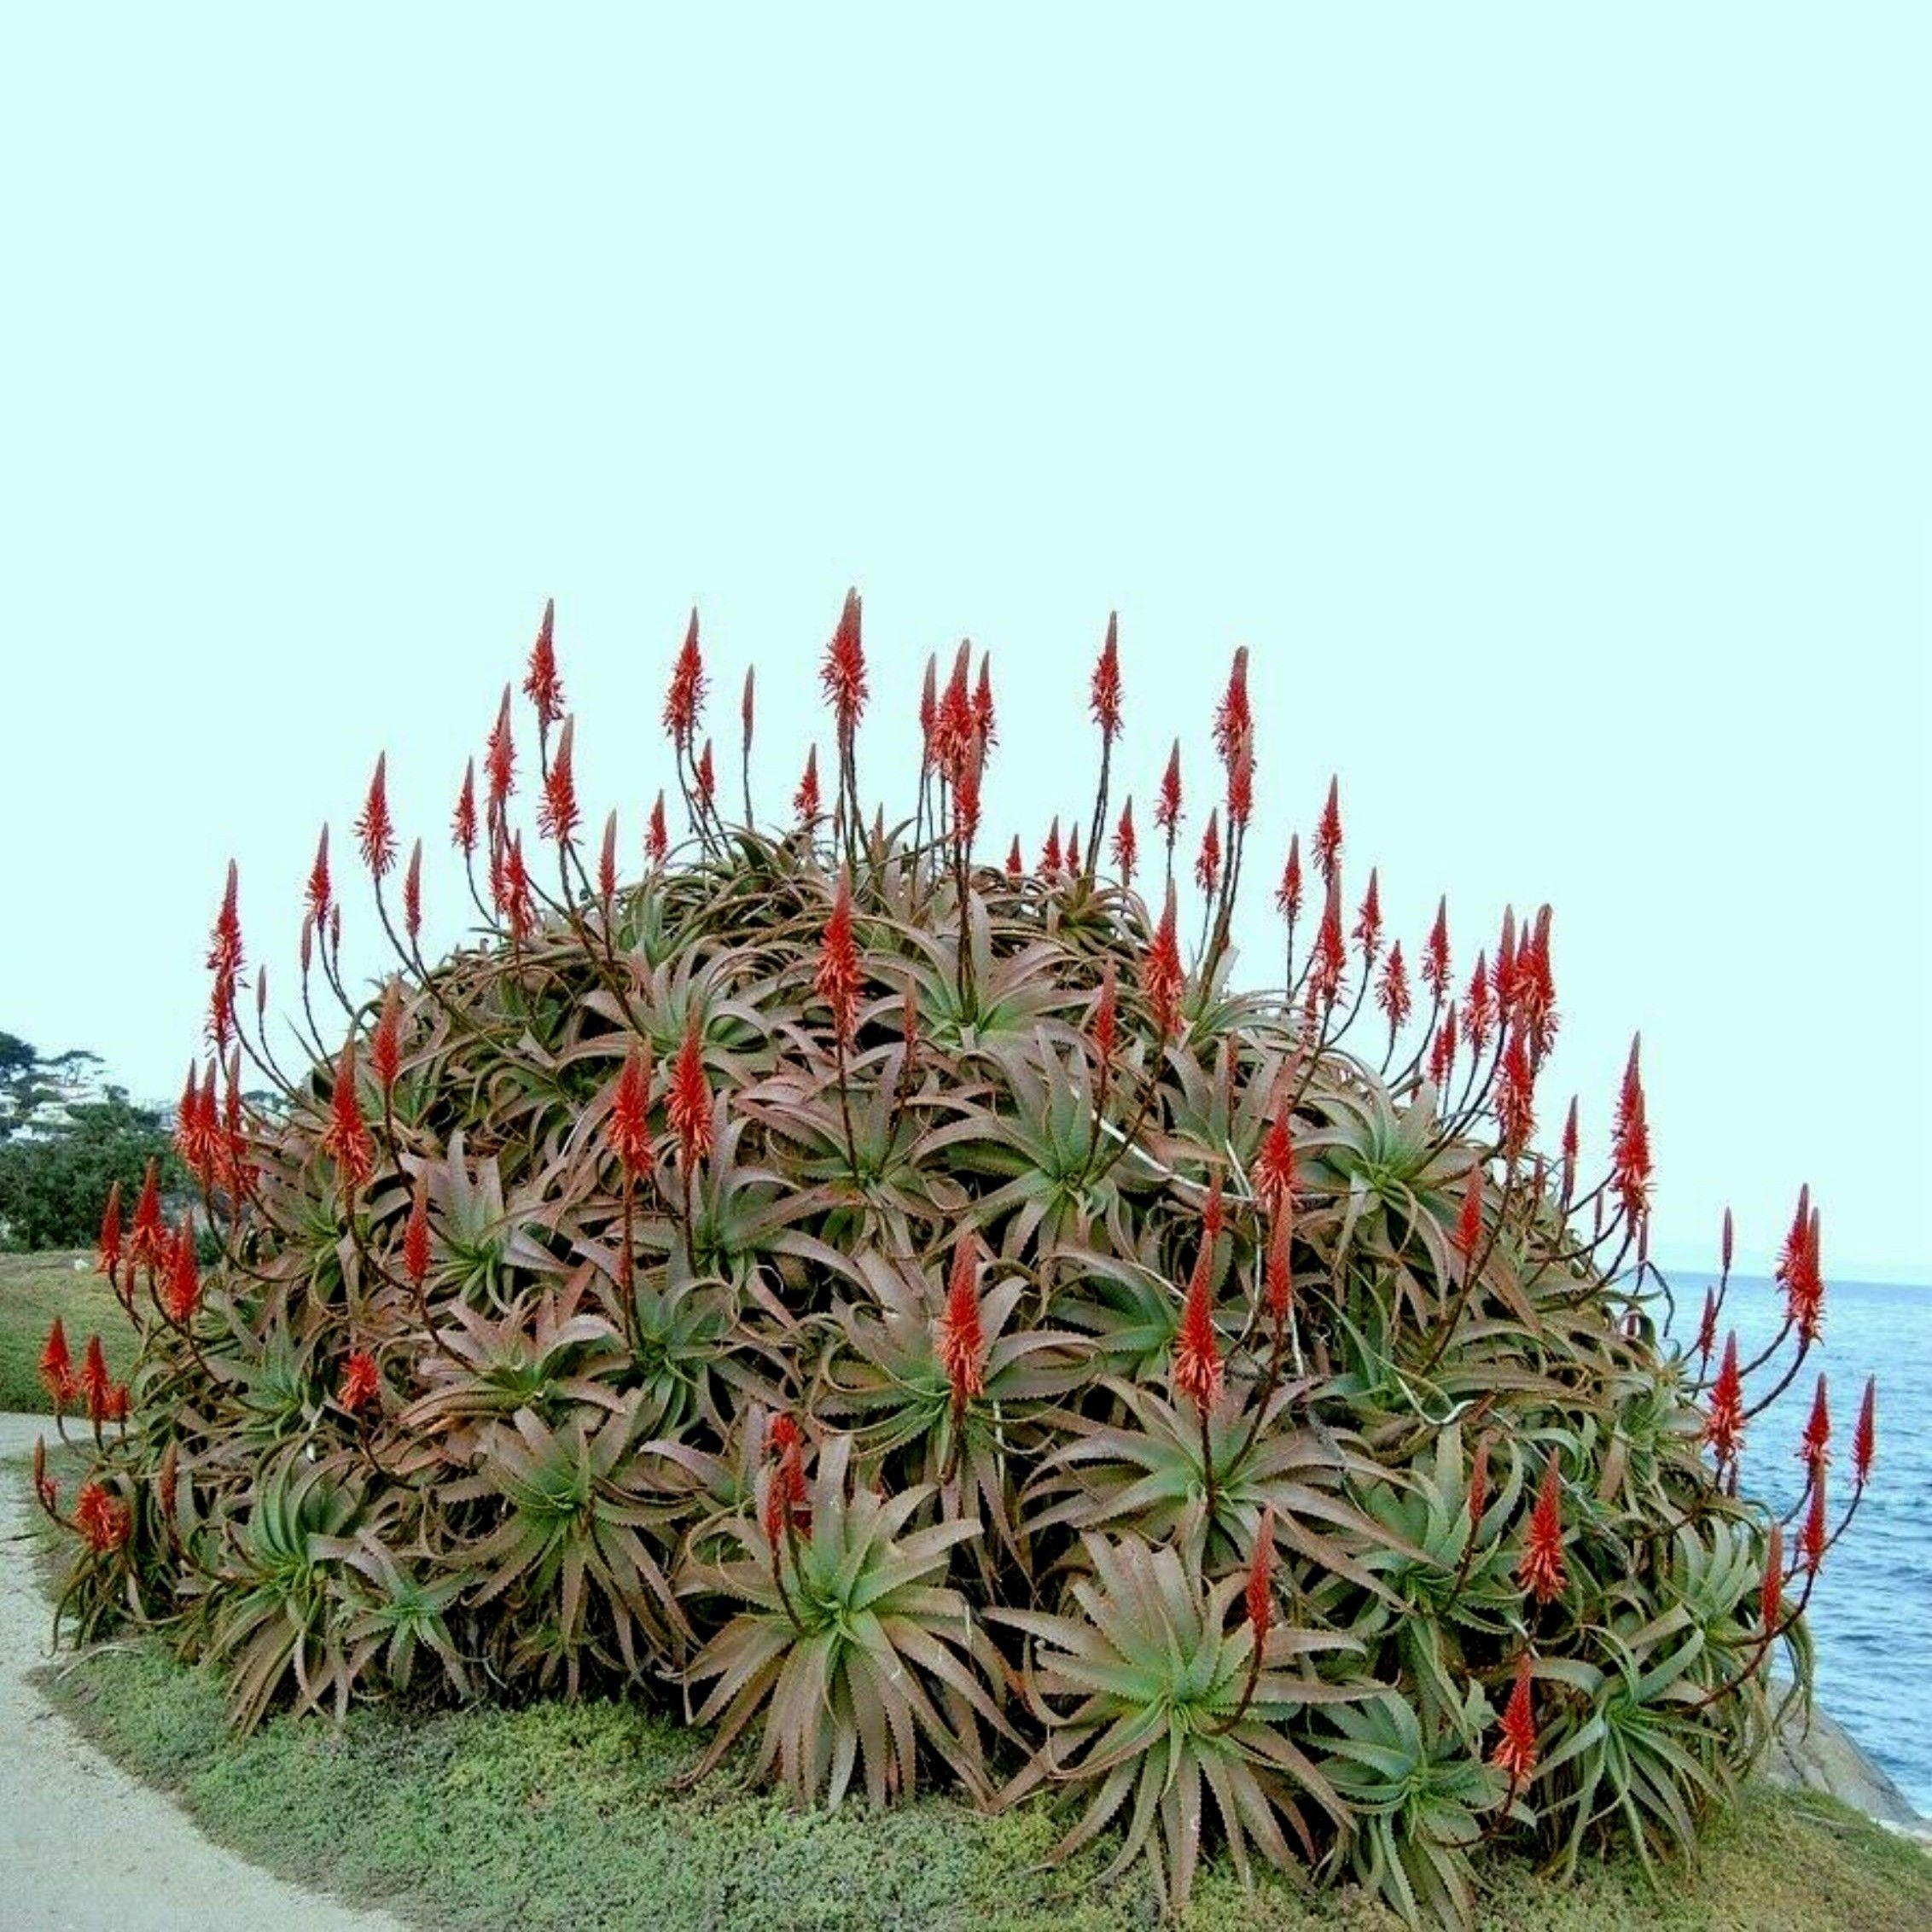 Krantz Aloe Candelabra Aloe Seeds Aloe Arborescens In 2020 Flowering Succulents Arborescens Perennial Plants